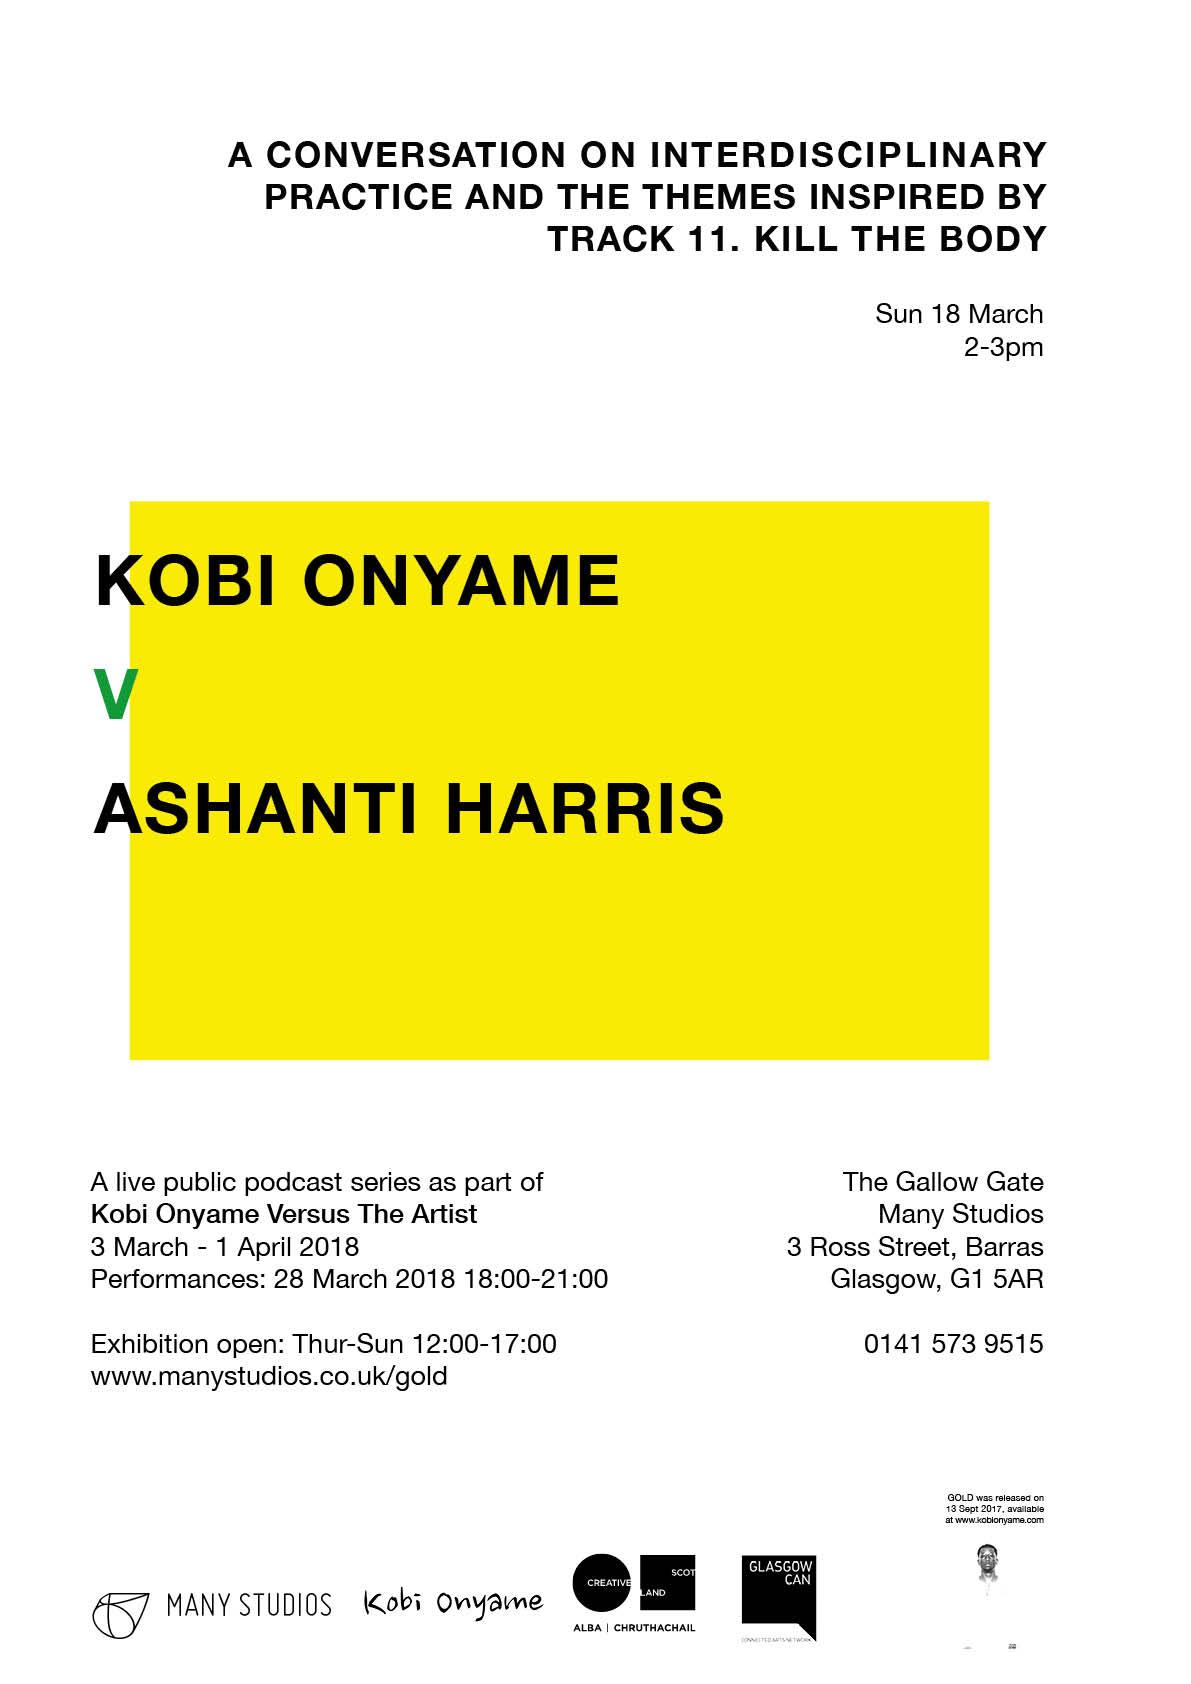 KobiOnyameVersus-podcast3ASH.jpg